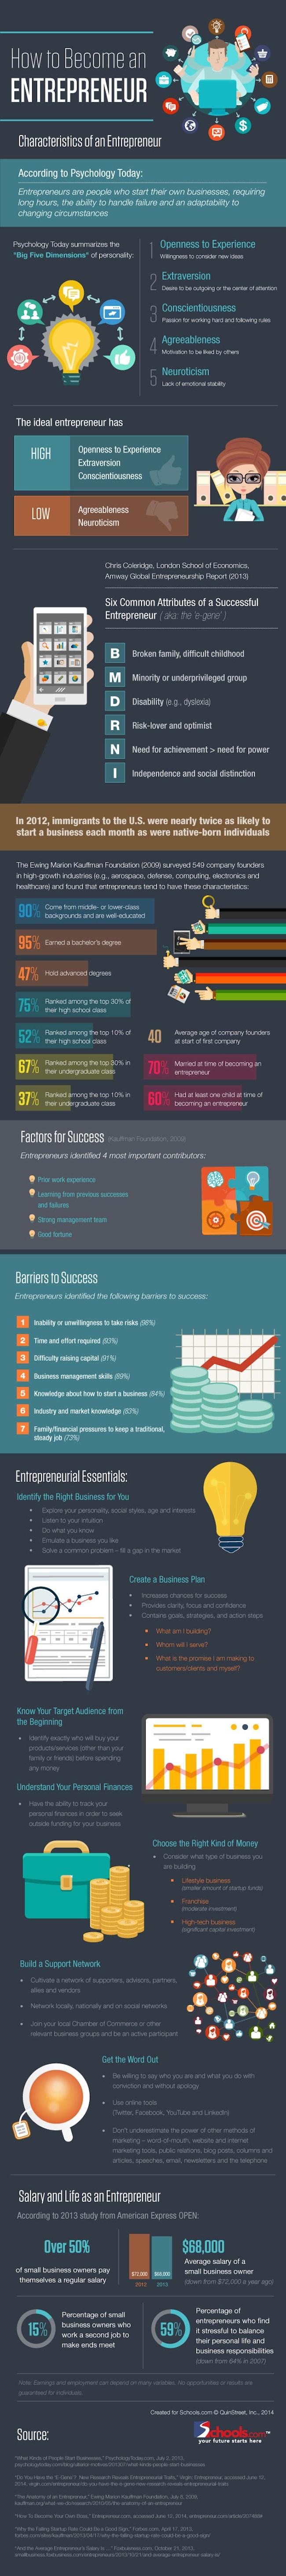 EntrepreneurCharacteristics_27974